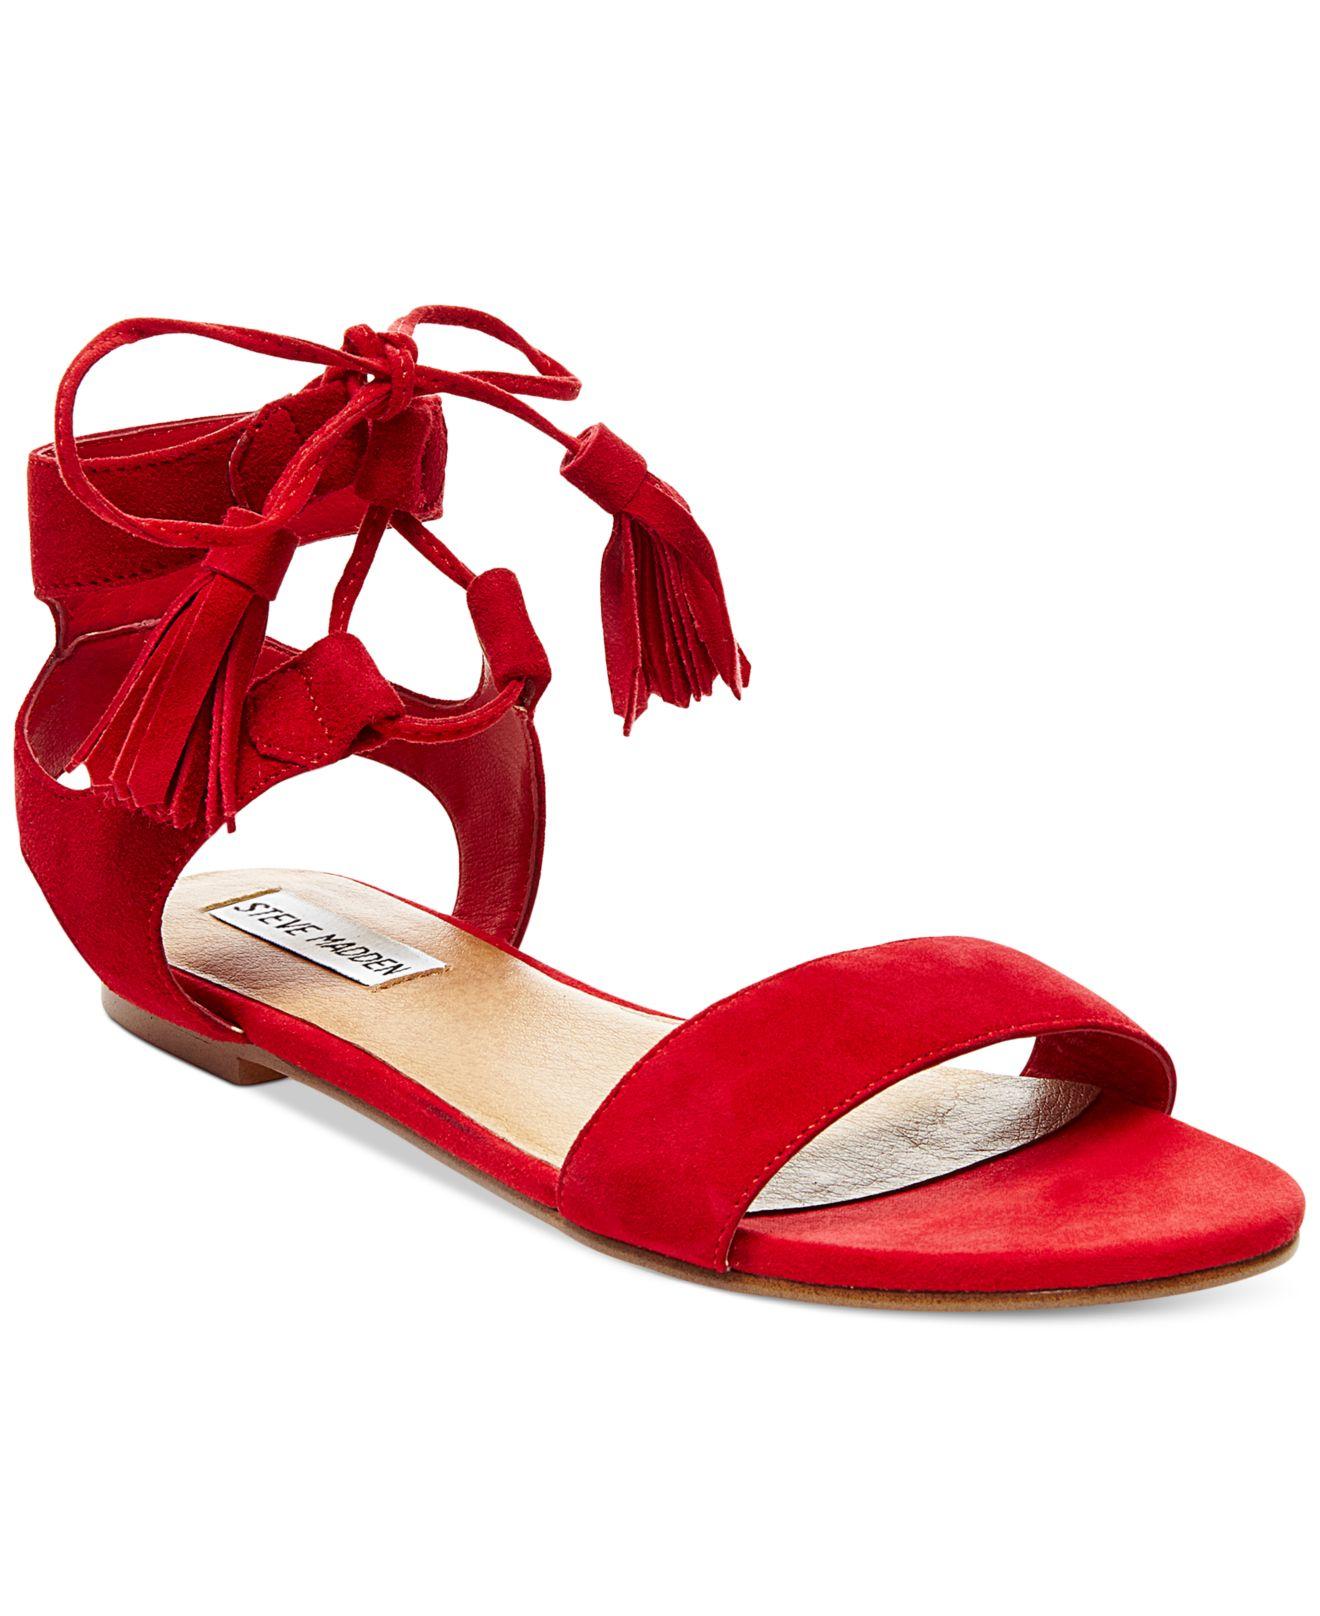 Red In Jgqsmpvluz Lyst Women's Daryyn Sandals Strappy Steve Madden ZXPuki